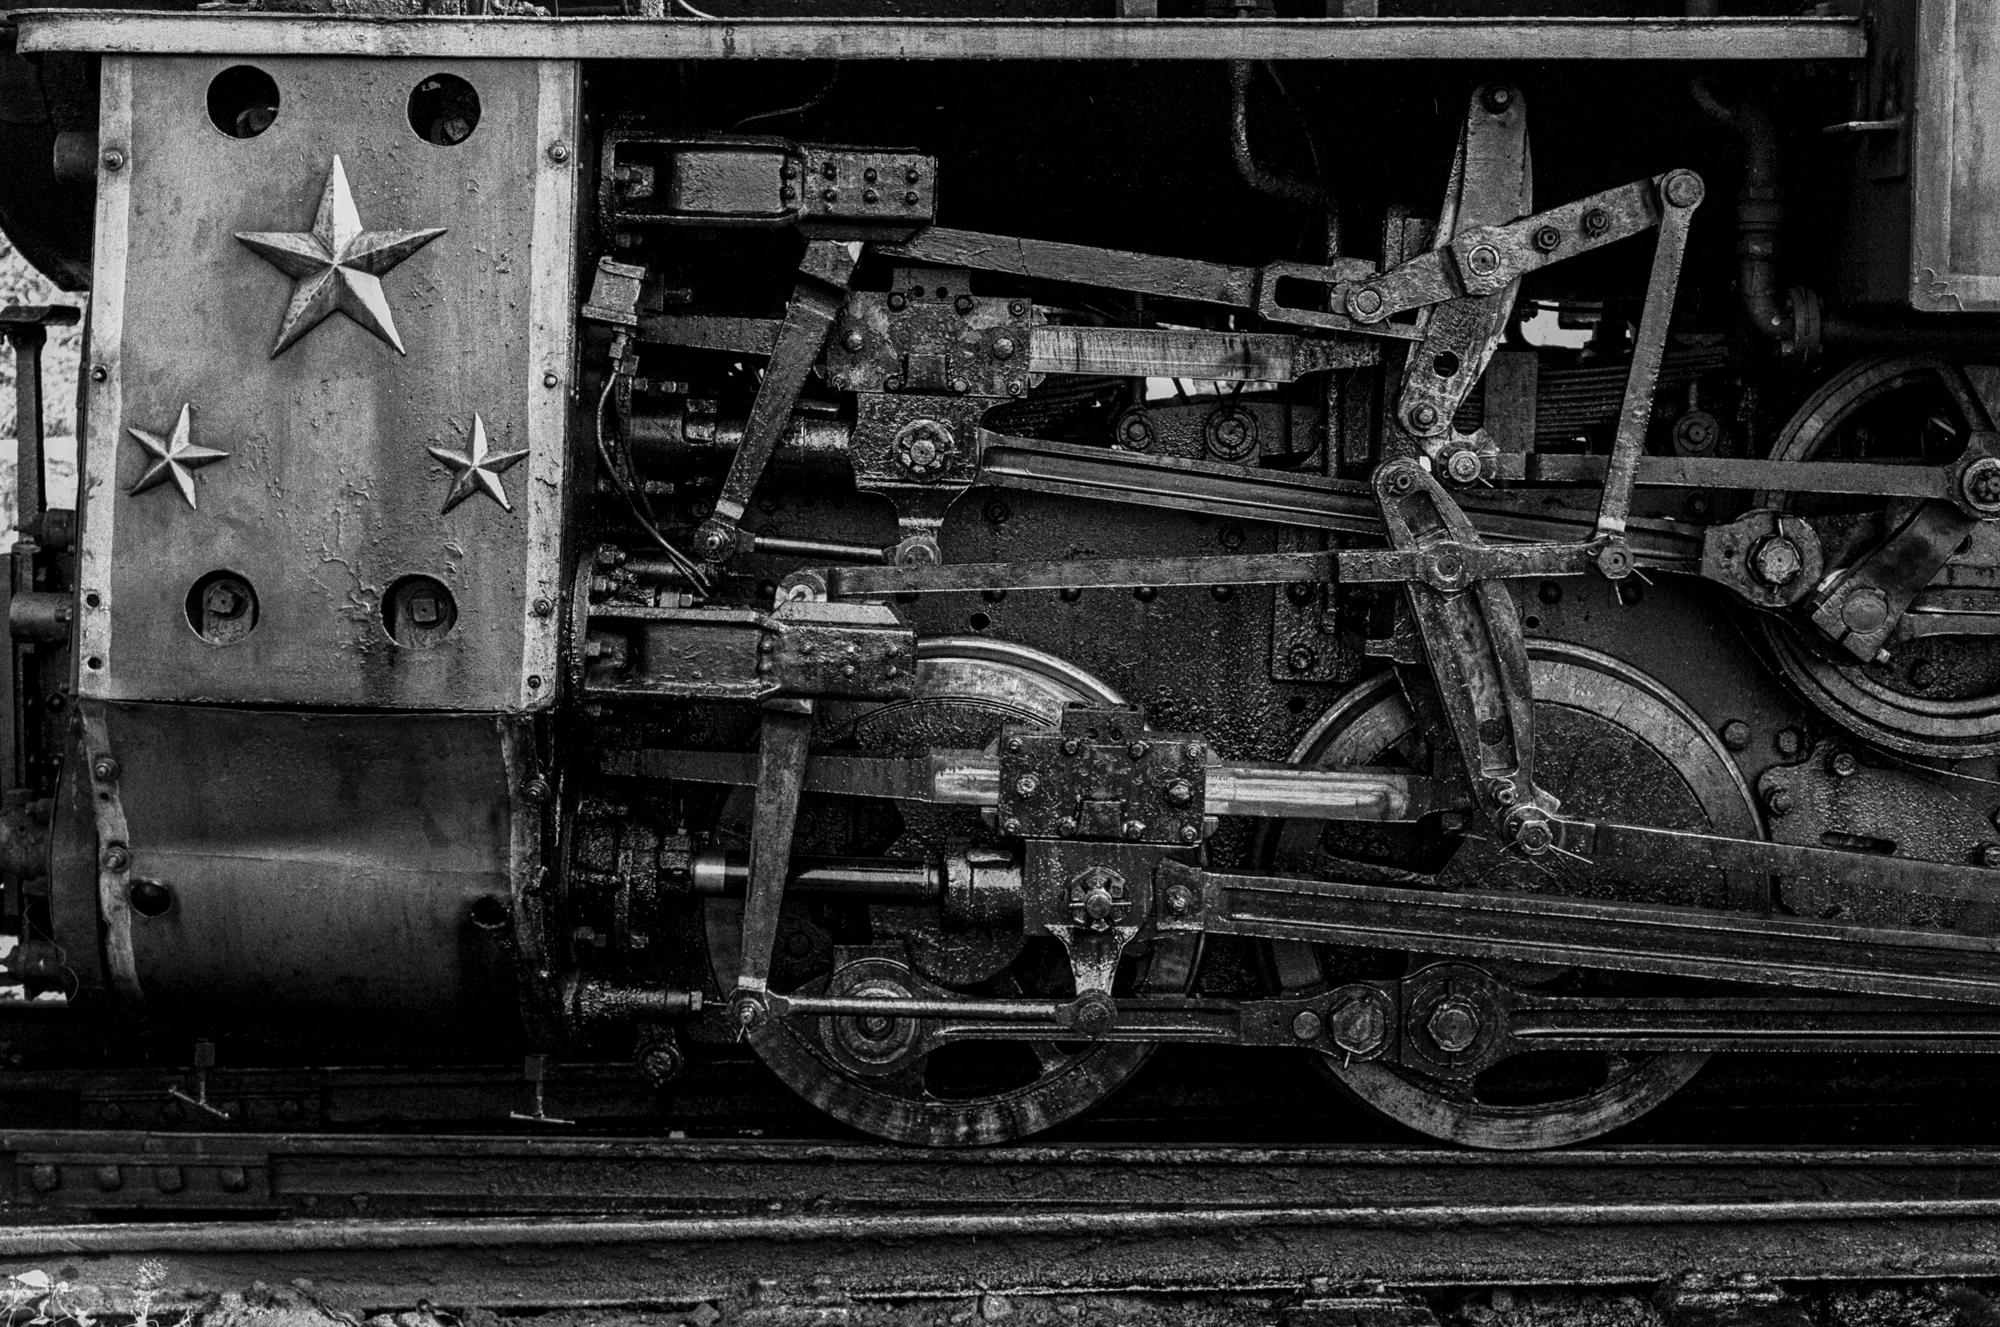 Close-up of train wheels (Pic: Nandakumar Narasimhan)